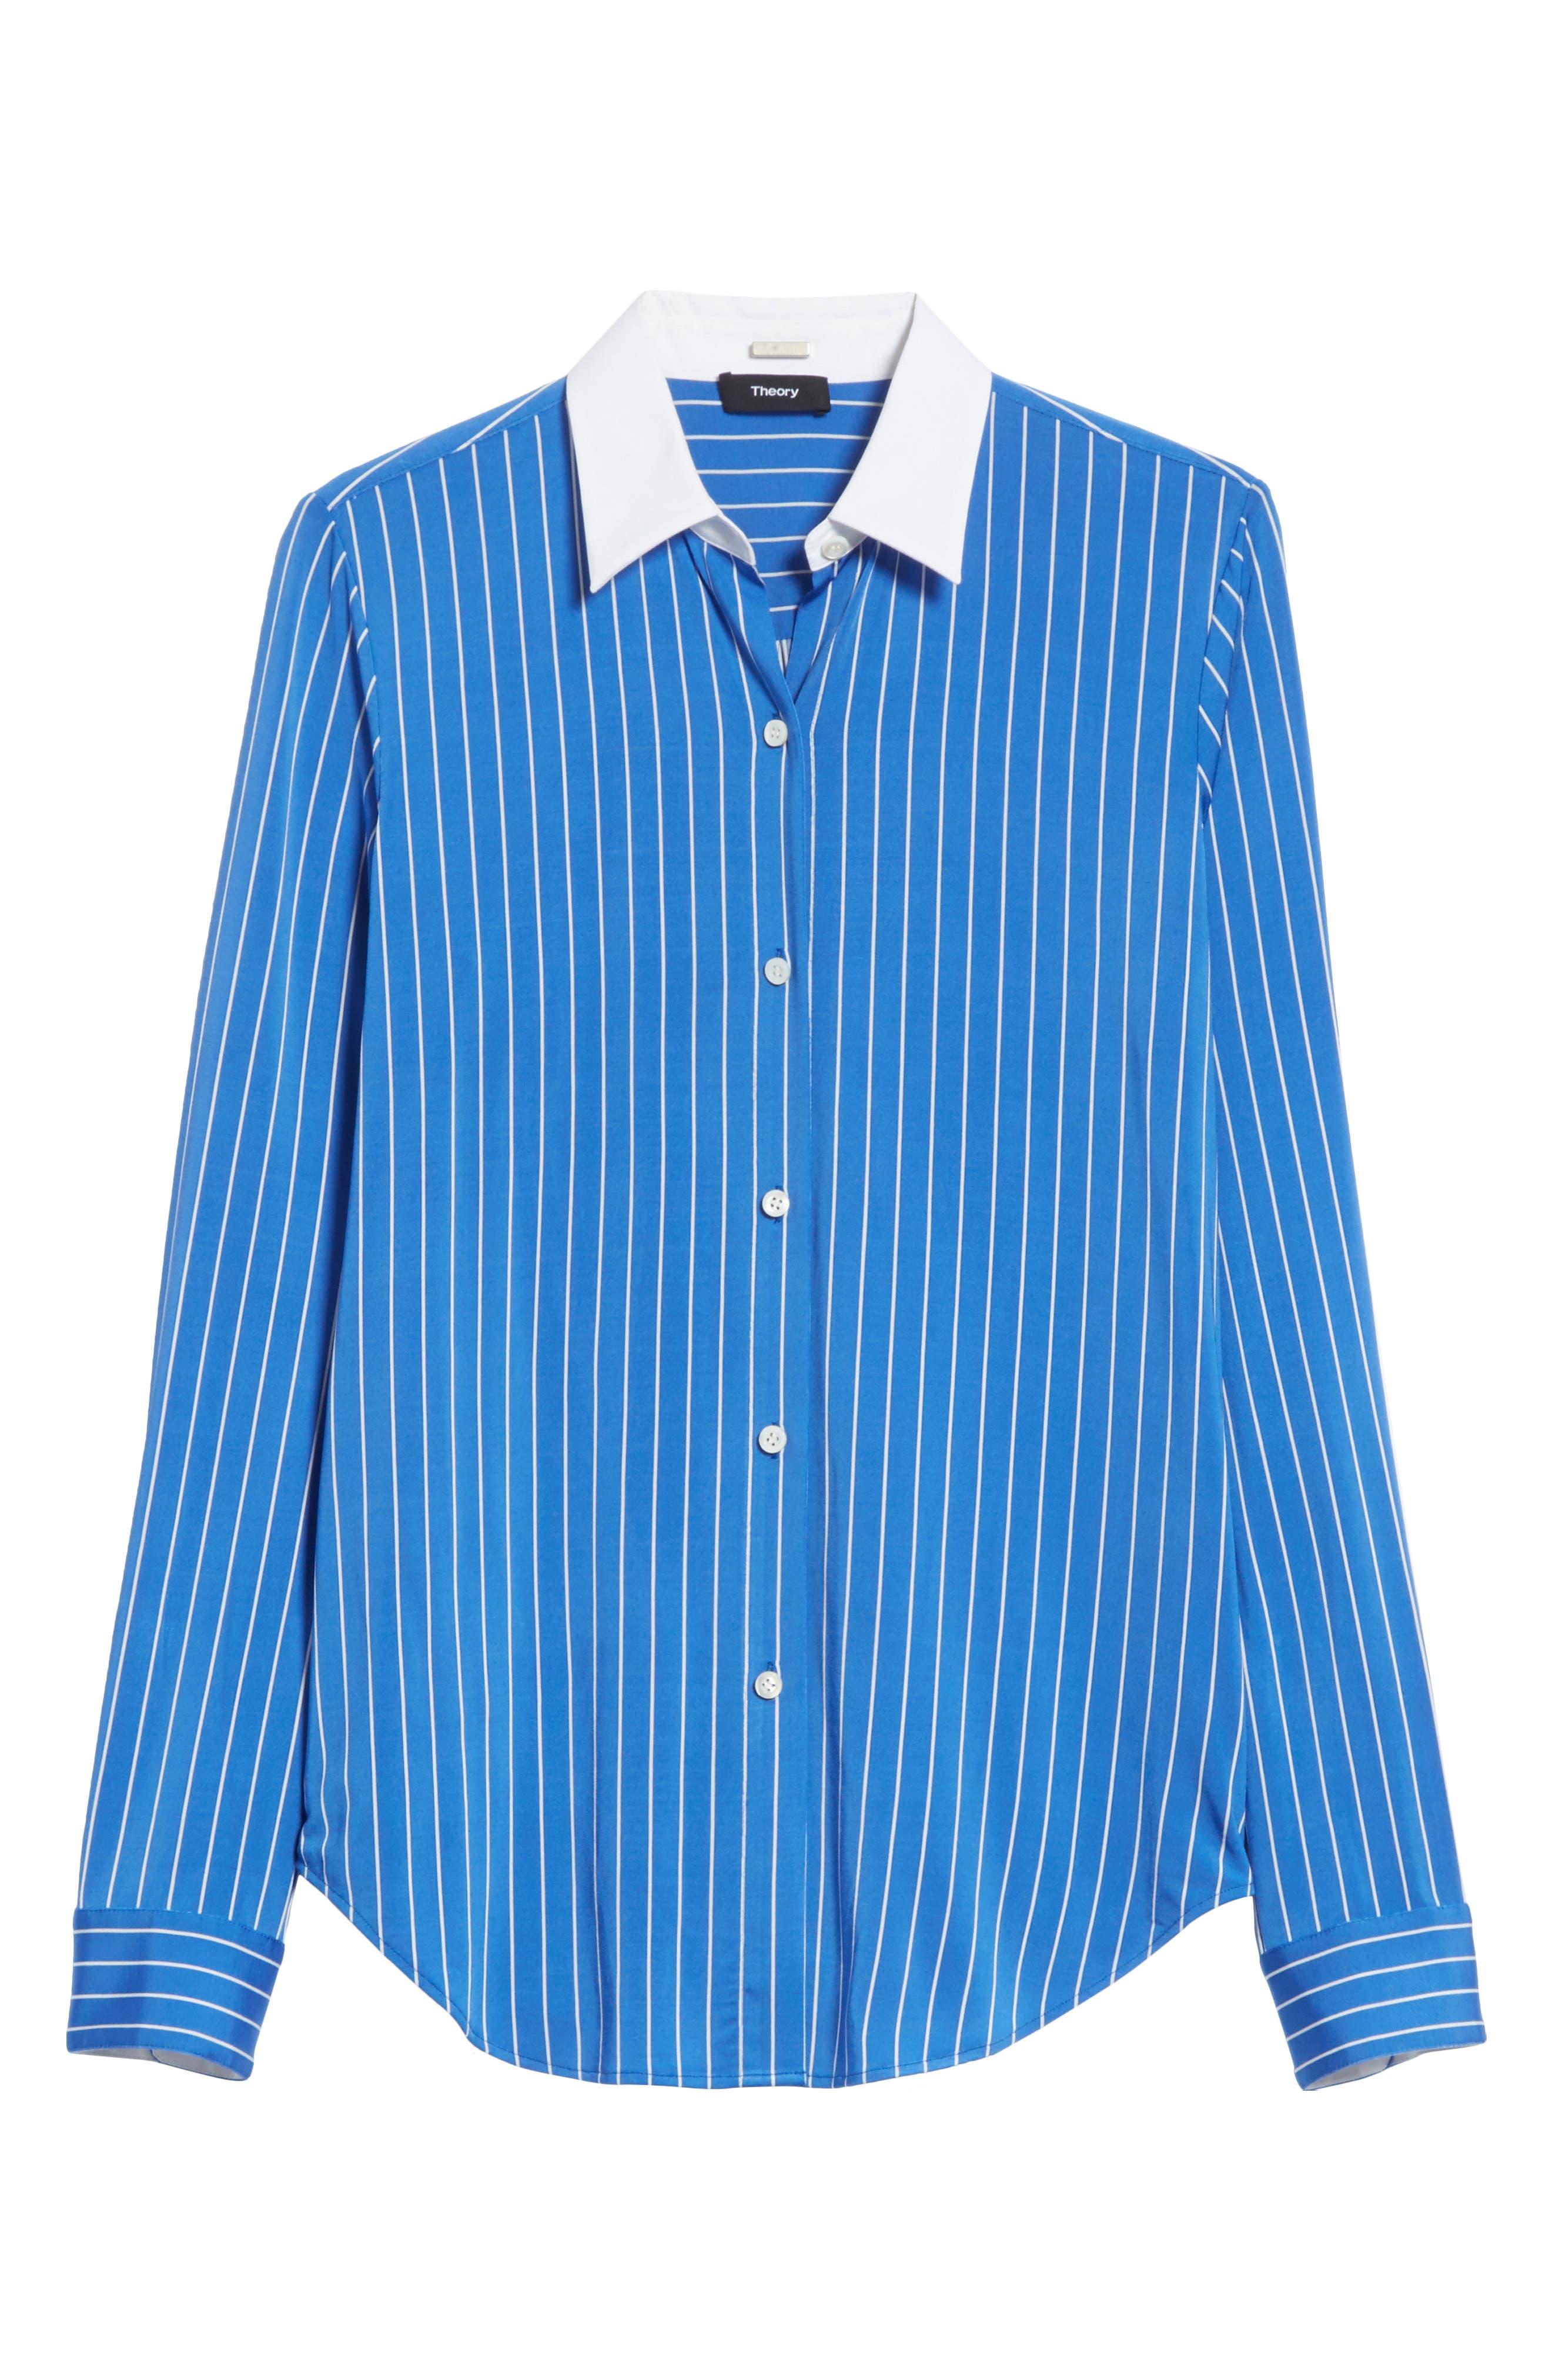 Essential Stripe Jersey Button Down Shirt,                             Alternate thumbnail 6, color,                             Blue/ White